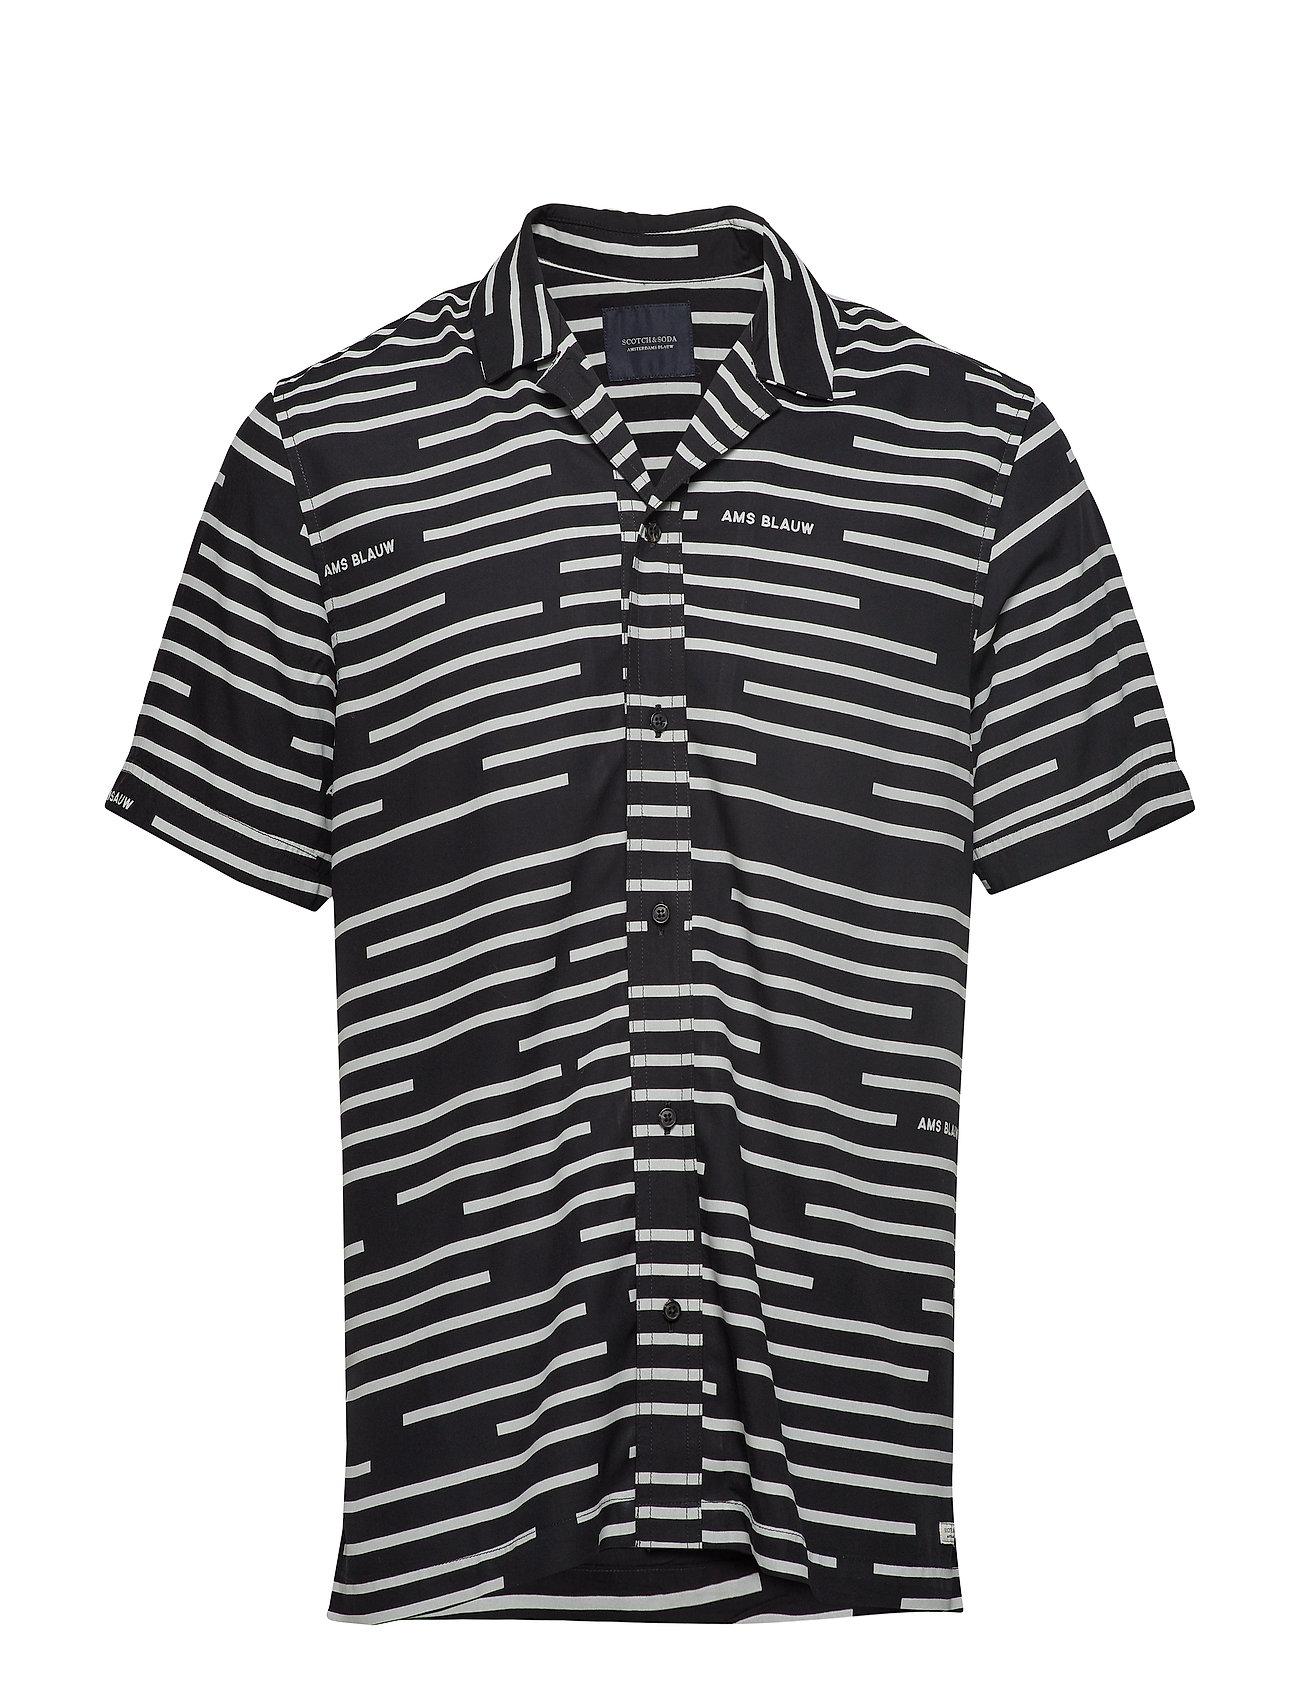 Scotch & Soda Short sleeve shirt with prints - COMBO A